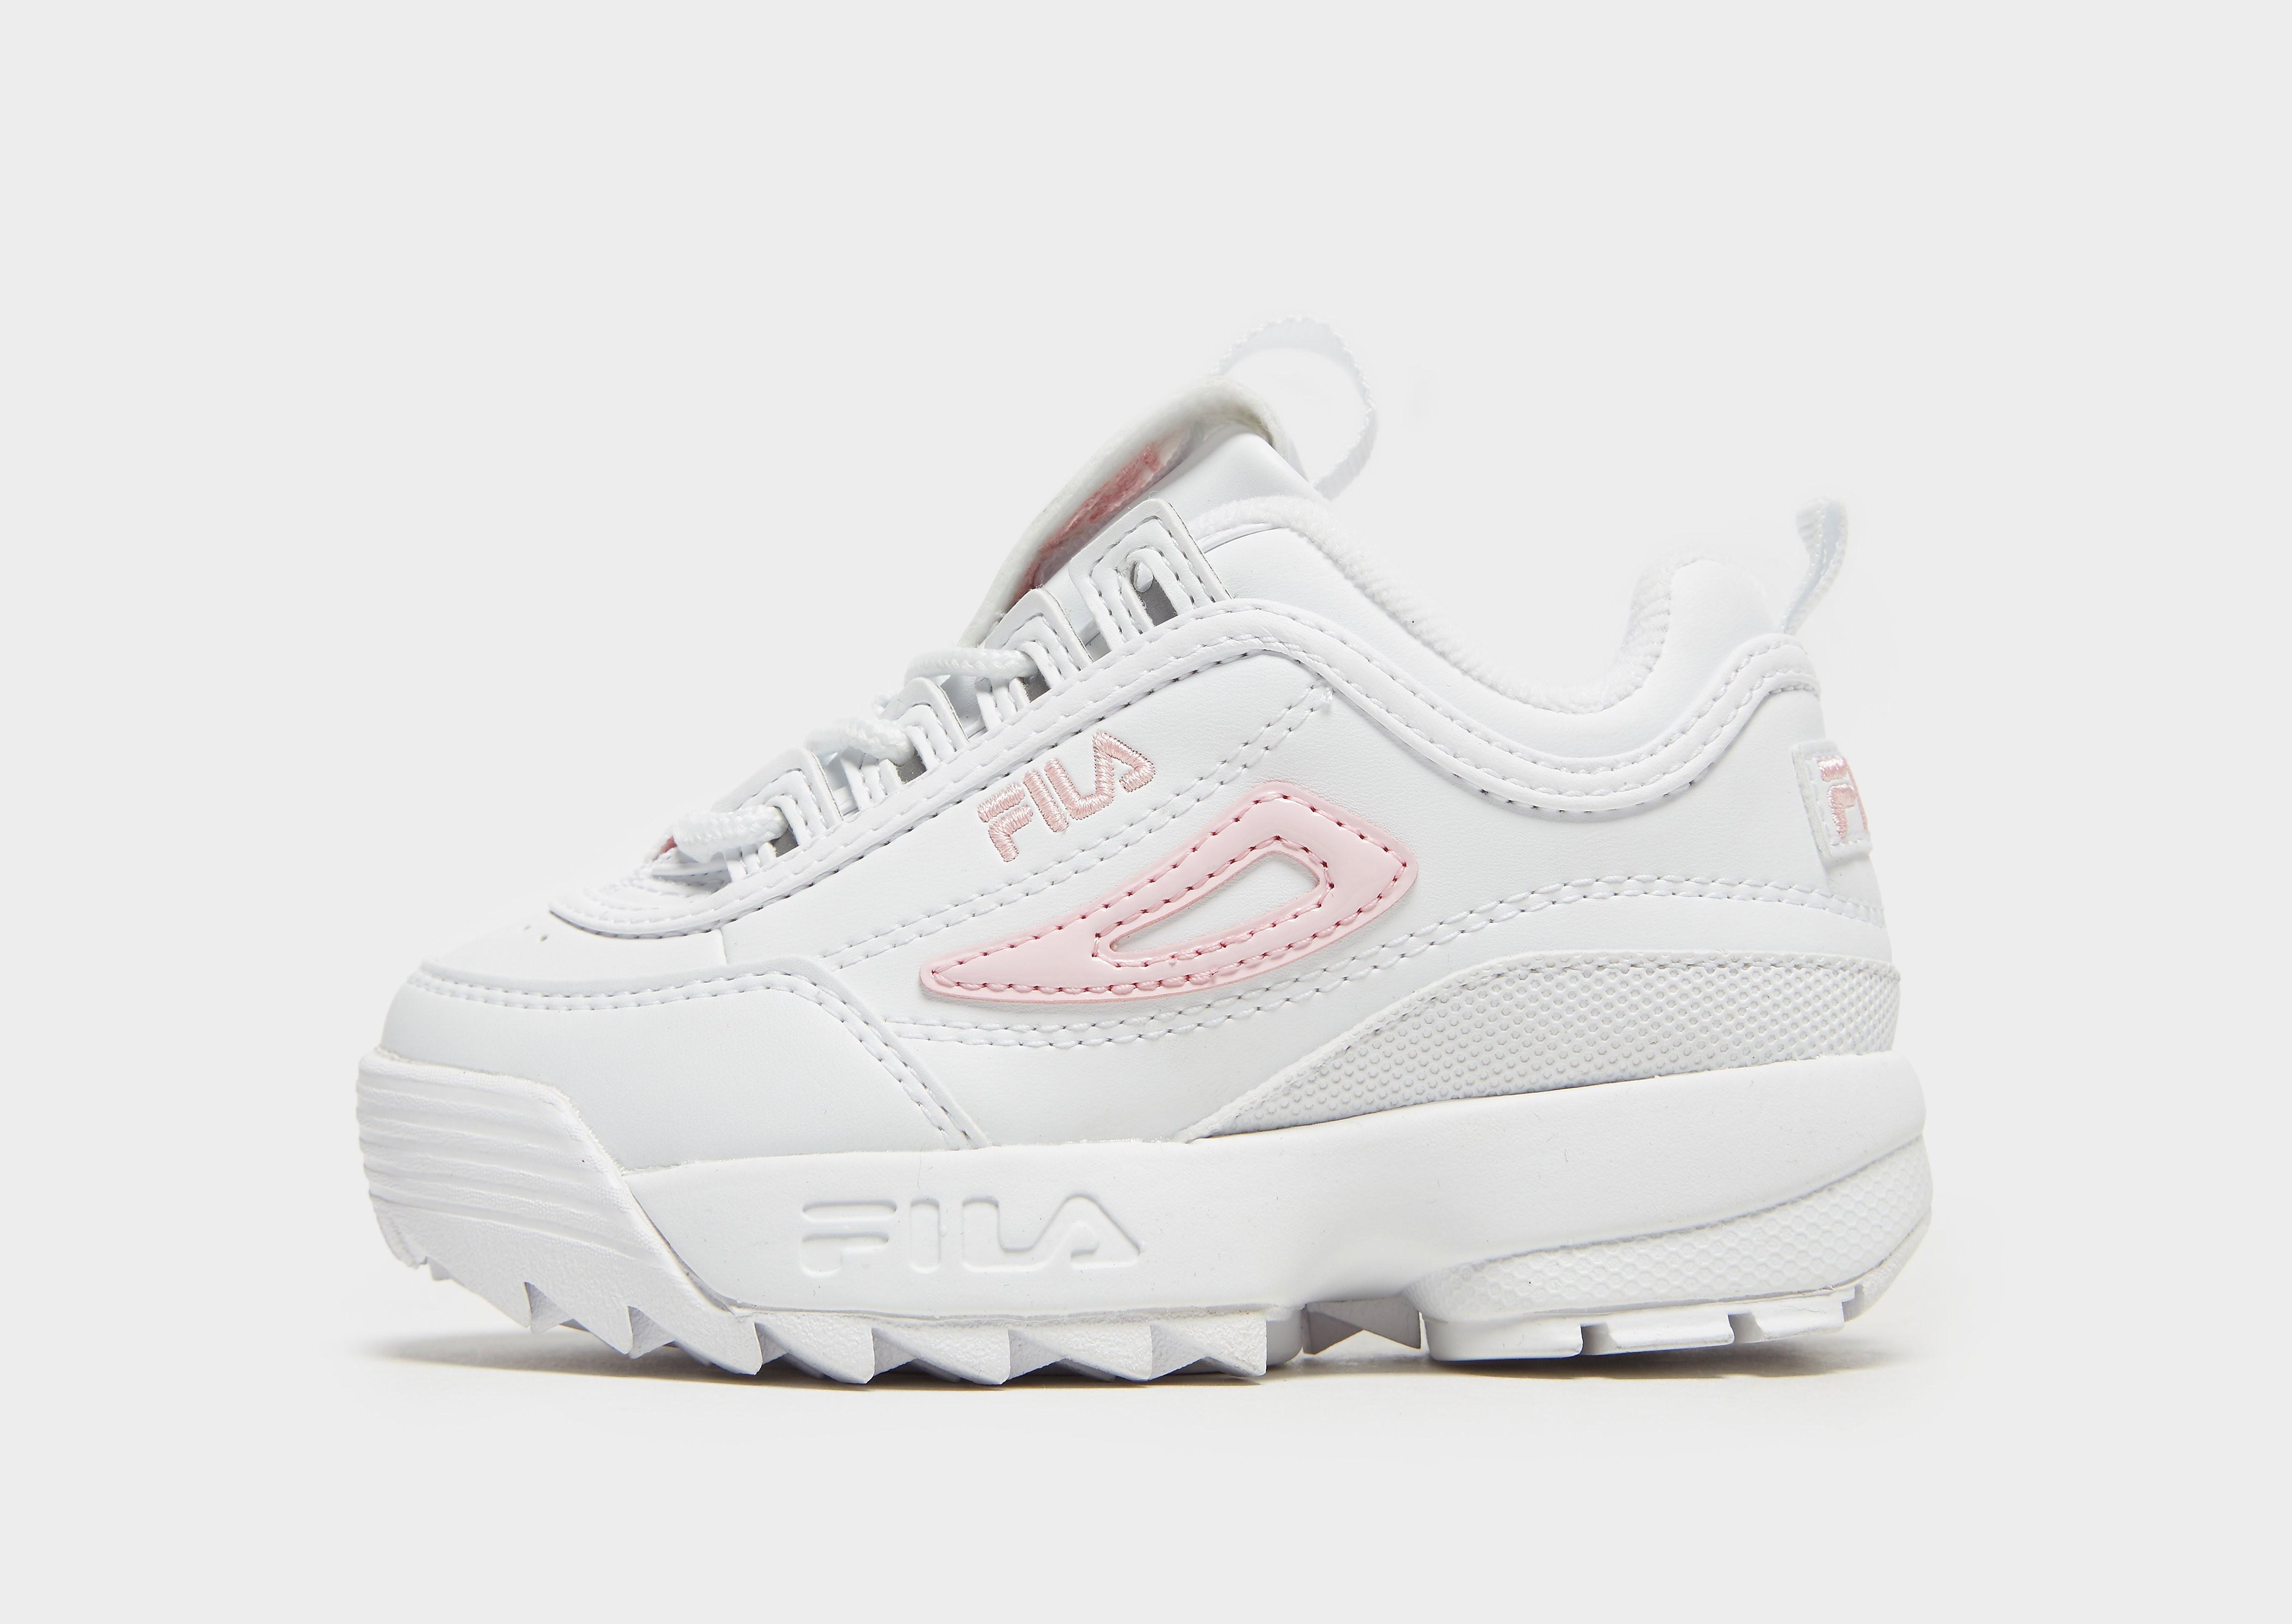 Sneaker Fila Fila Disruptor II para bebé - Only at JD